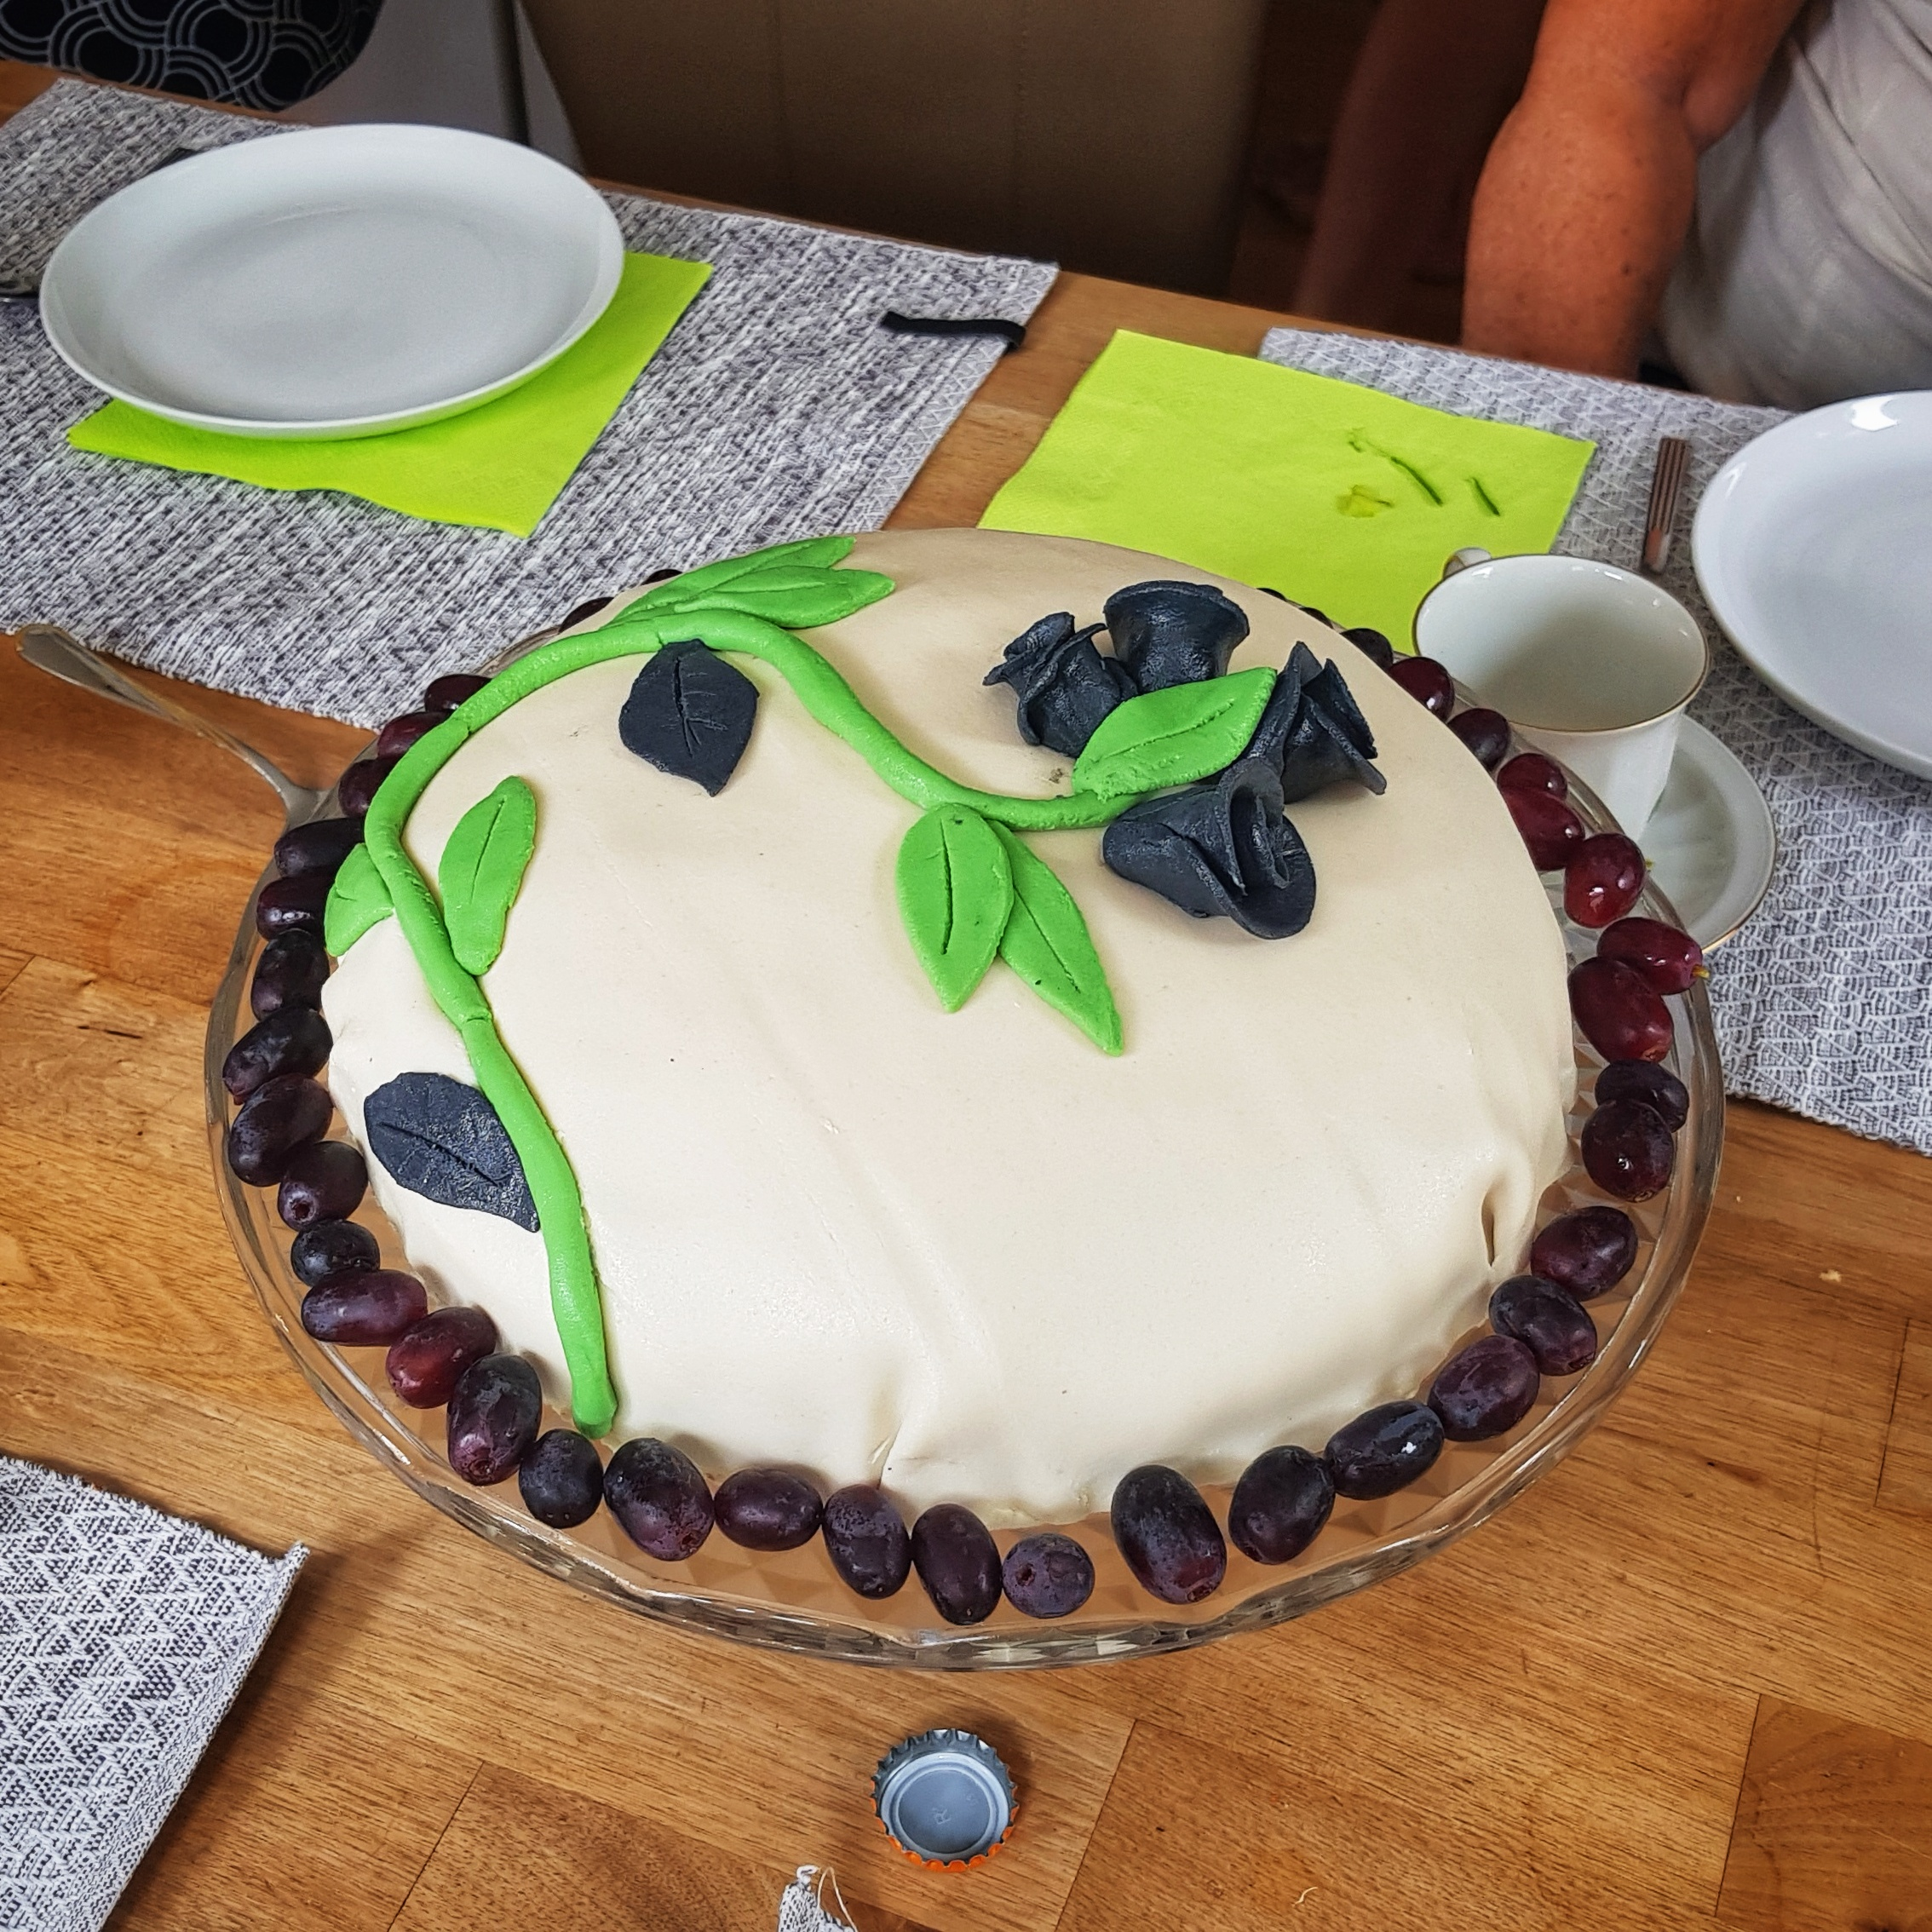 Day 148 - May 28: 16th Birthday Cake